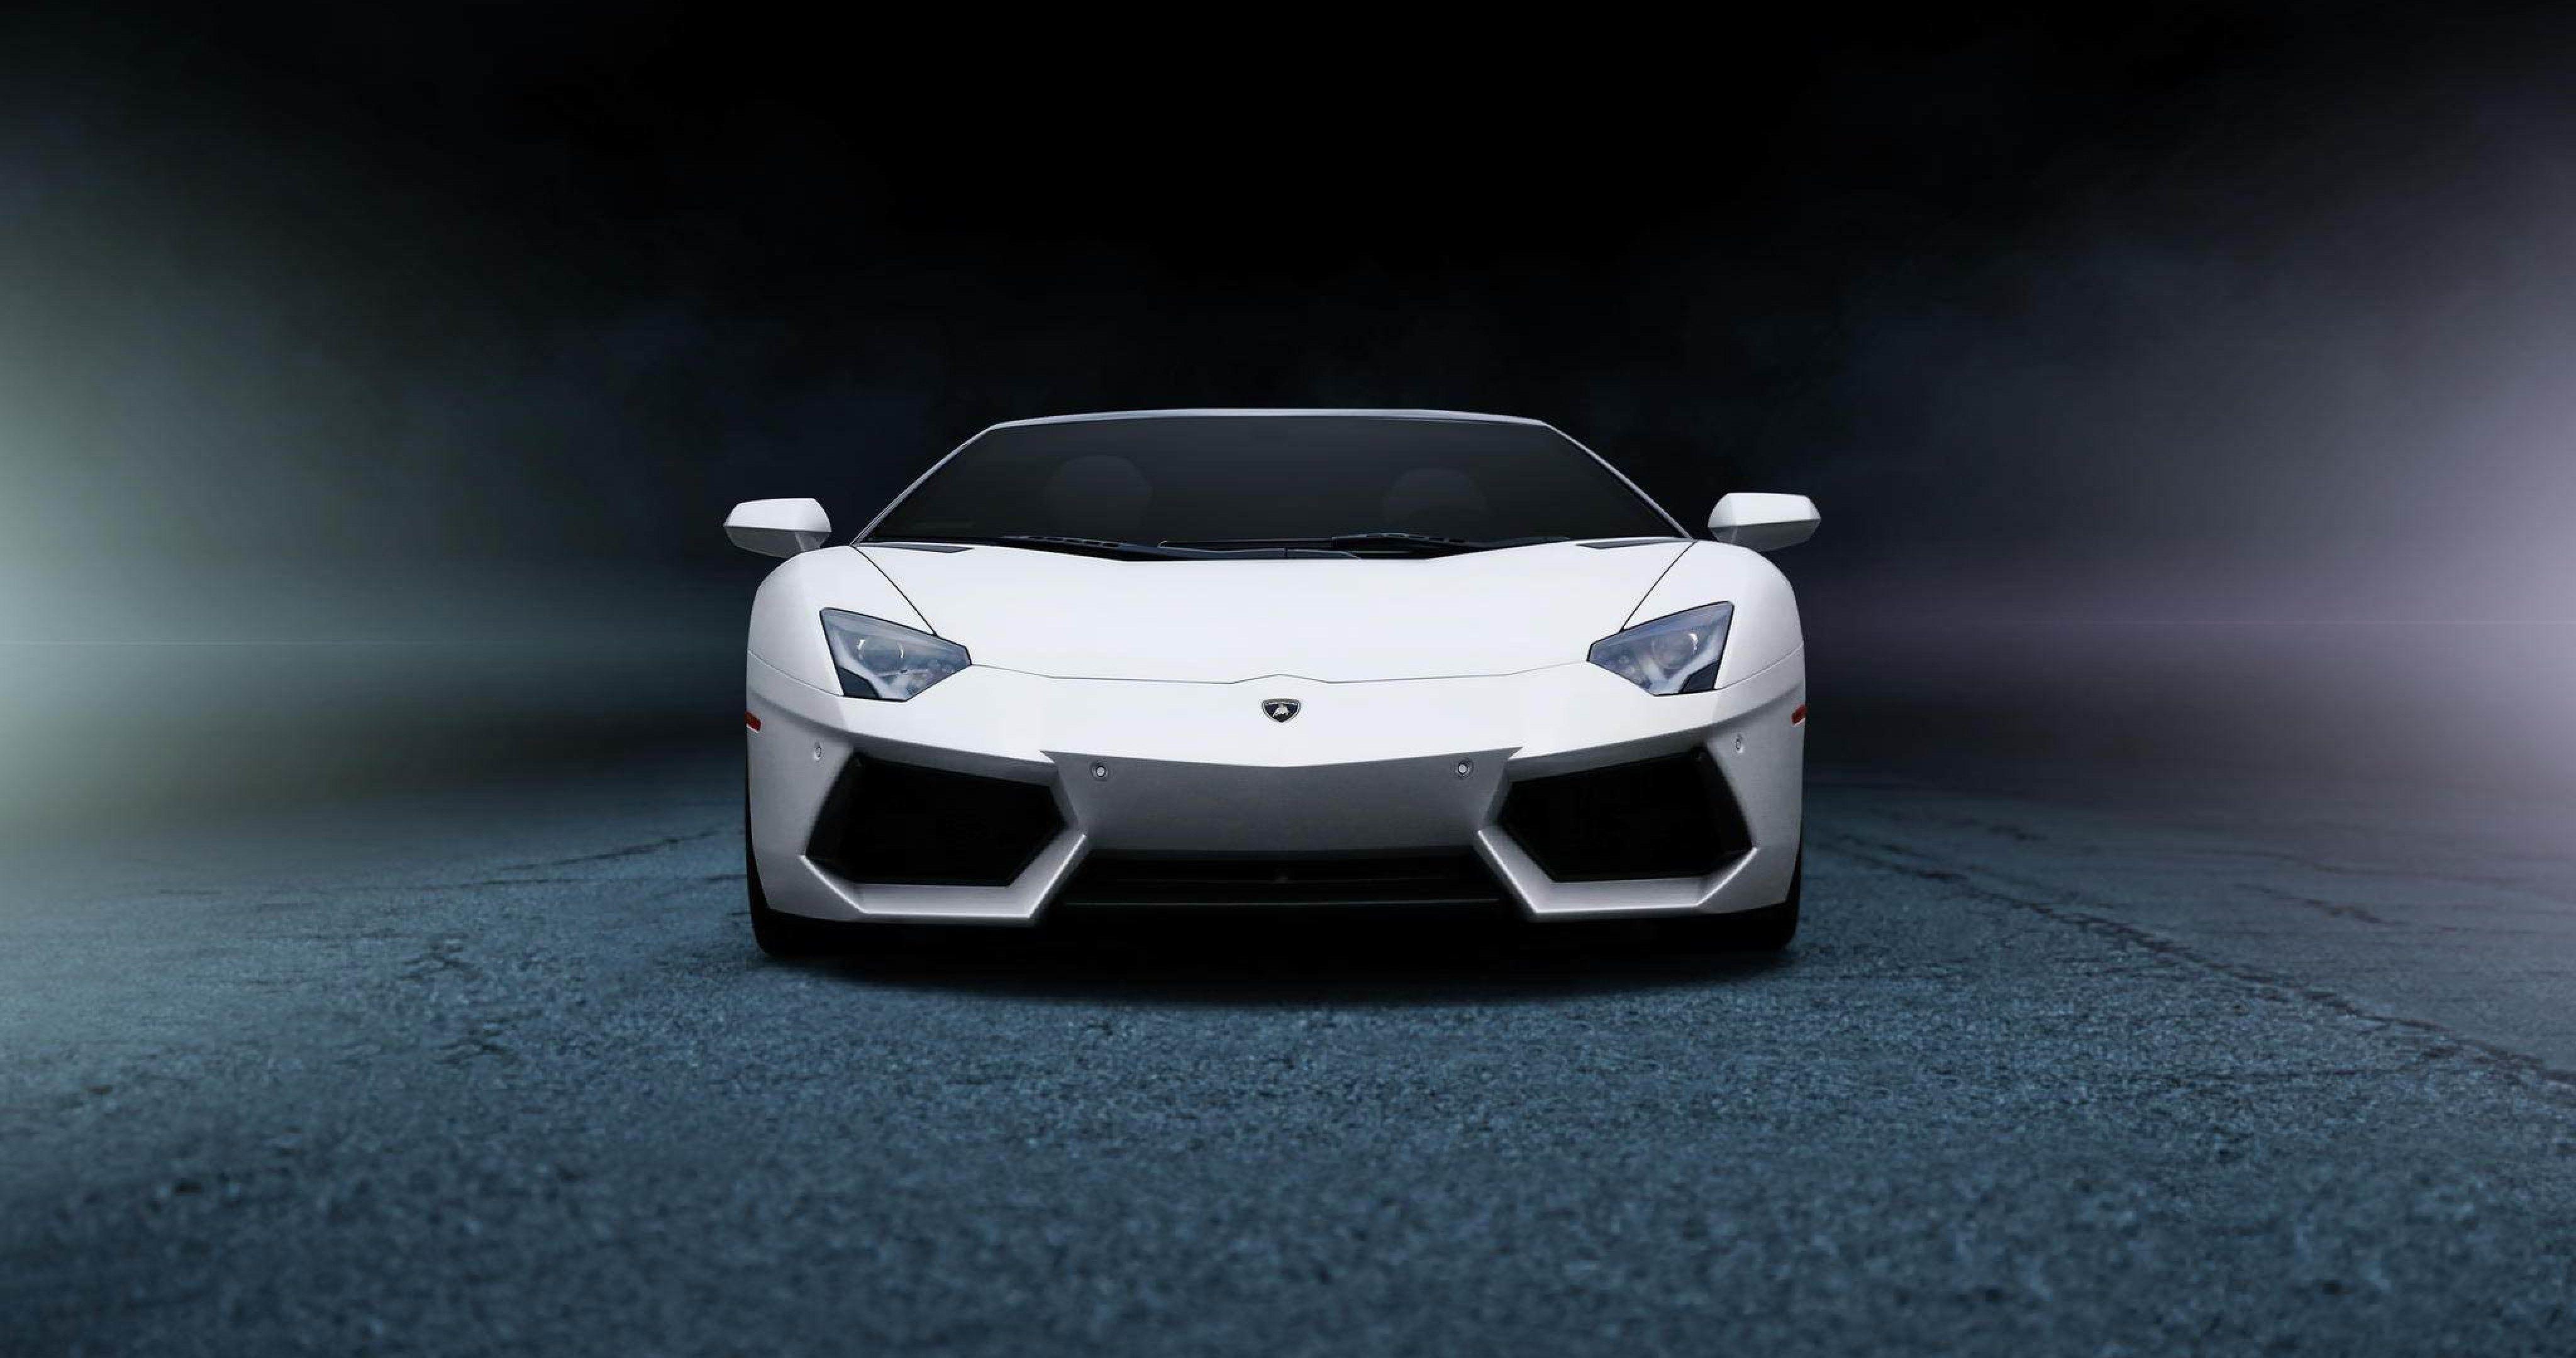 Lamborghini Aventador Lp700 4 Amazing 4k Ultra Hd Wallpaper